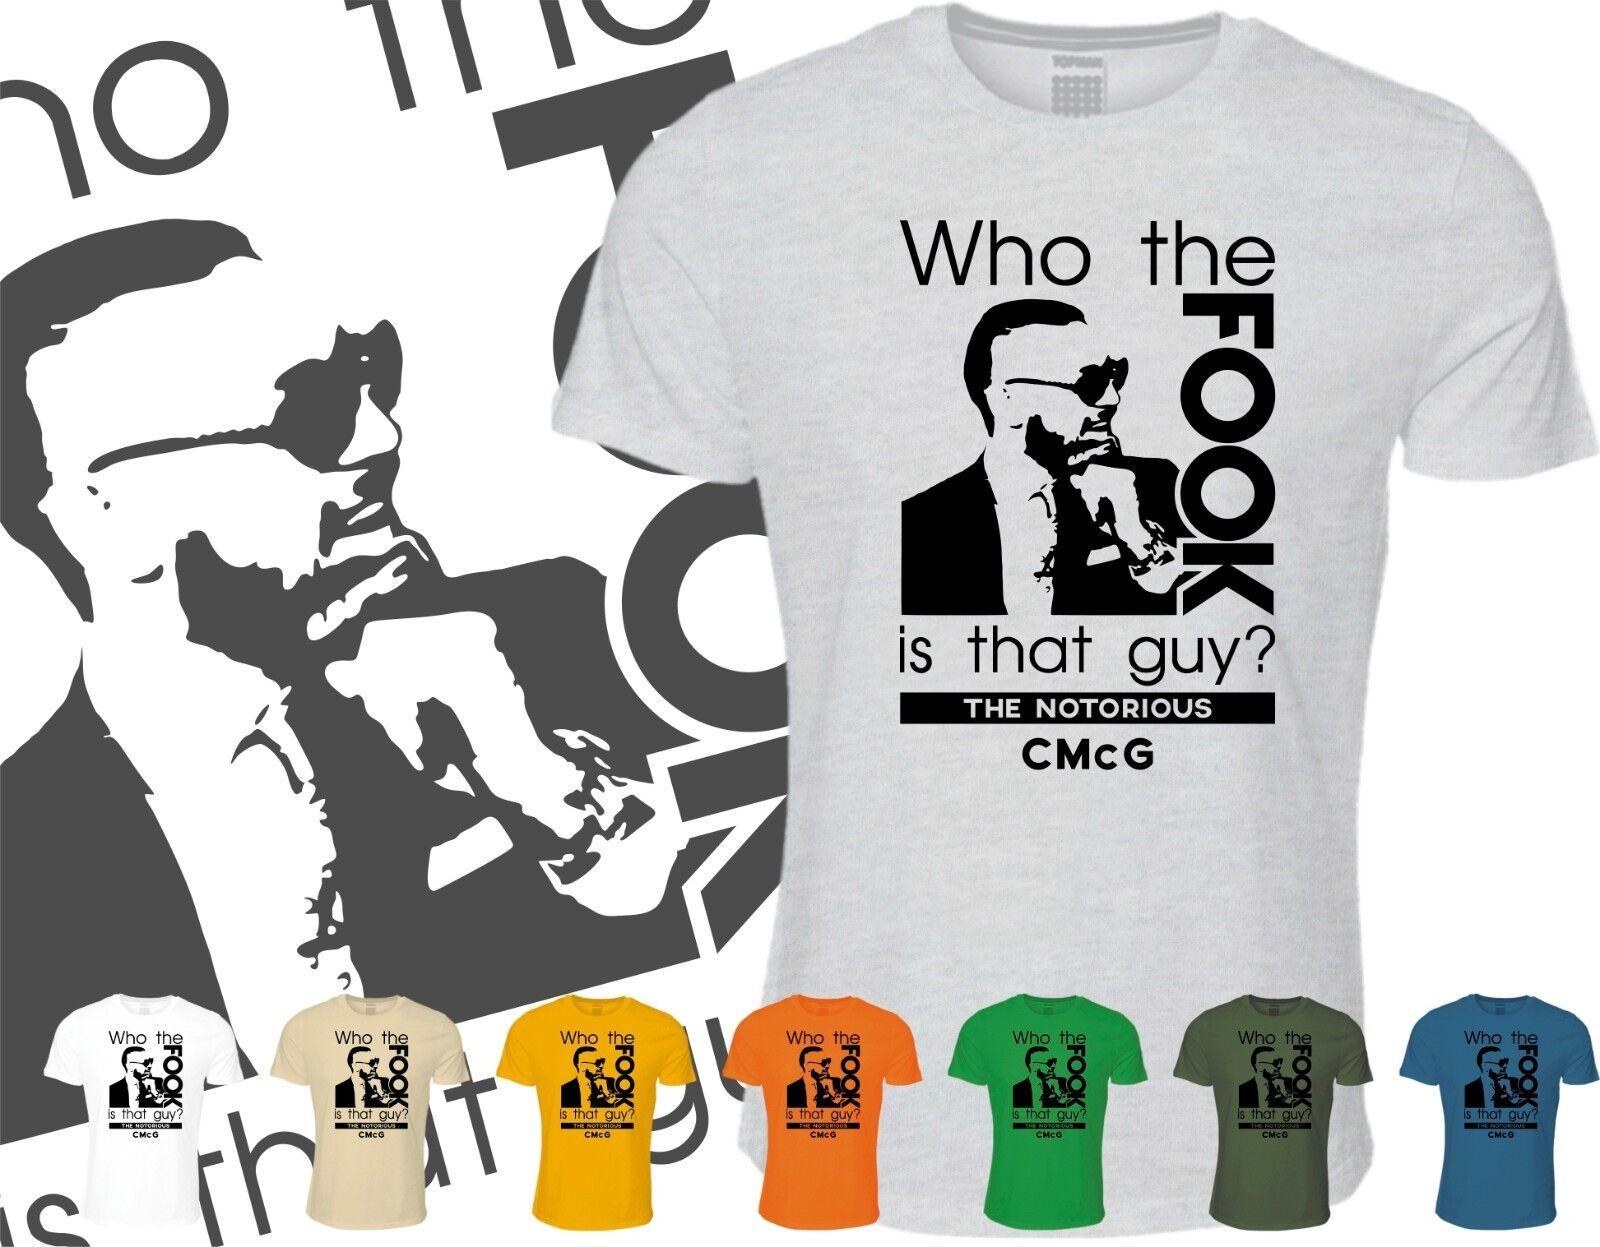 Conor mcgregor le qui le mcgregor fook est que guy t-shirt mma ufc 205 célèbre champion 6aa710